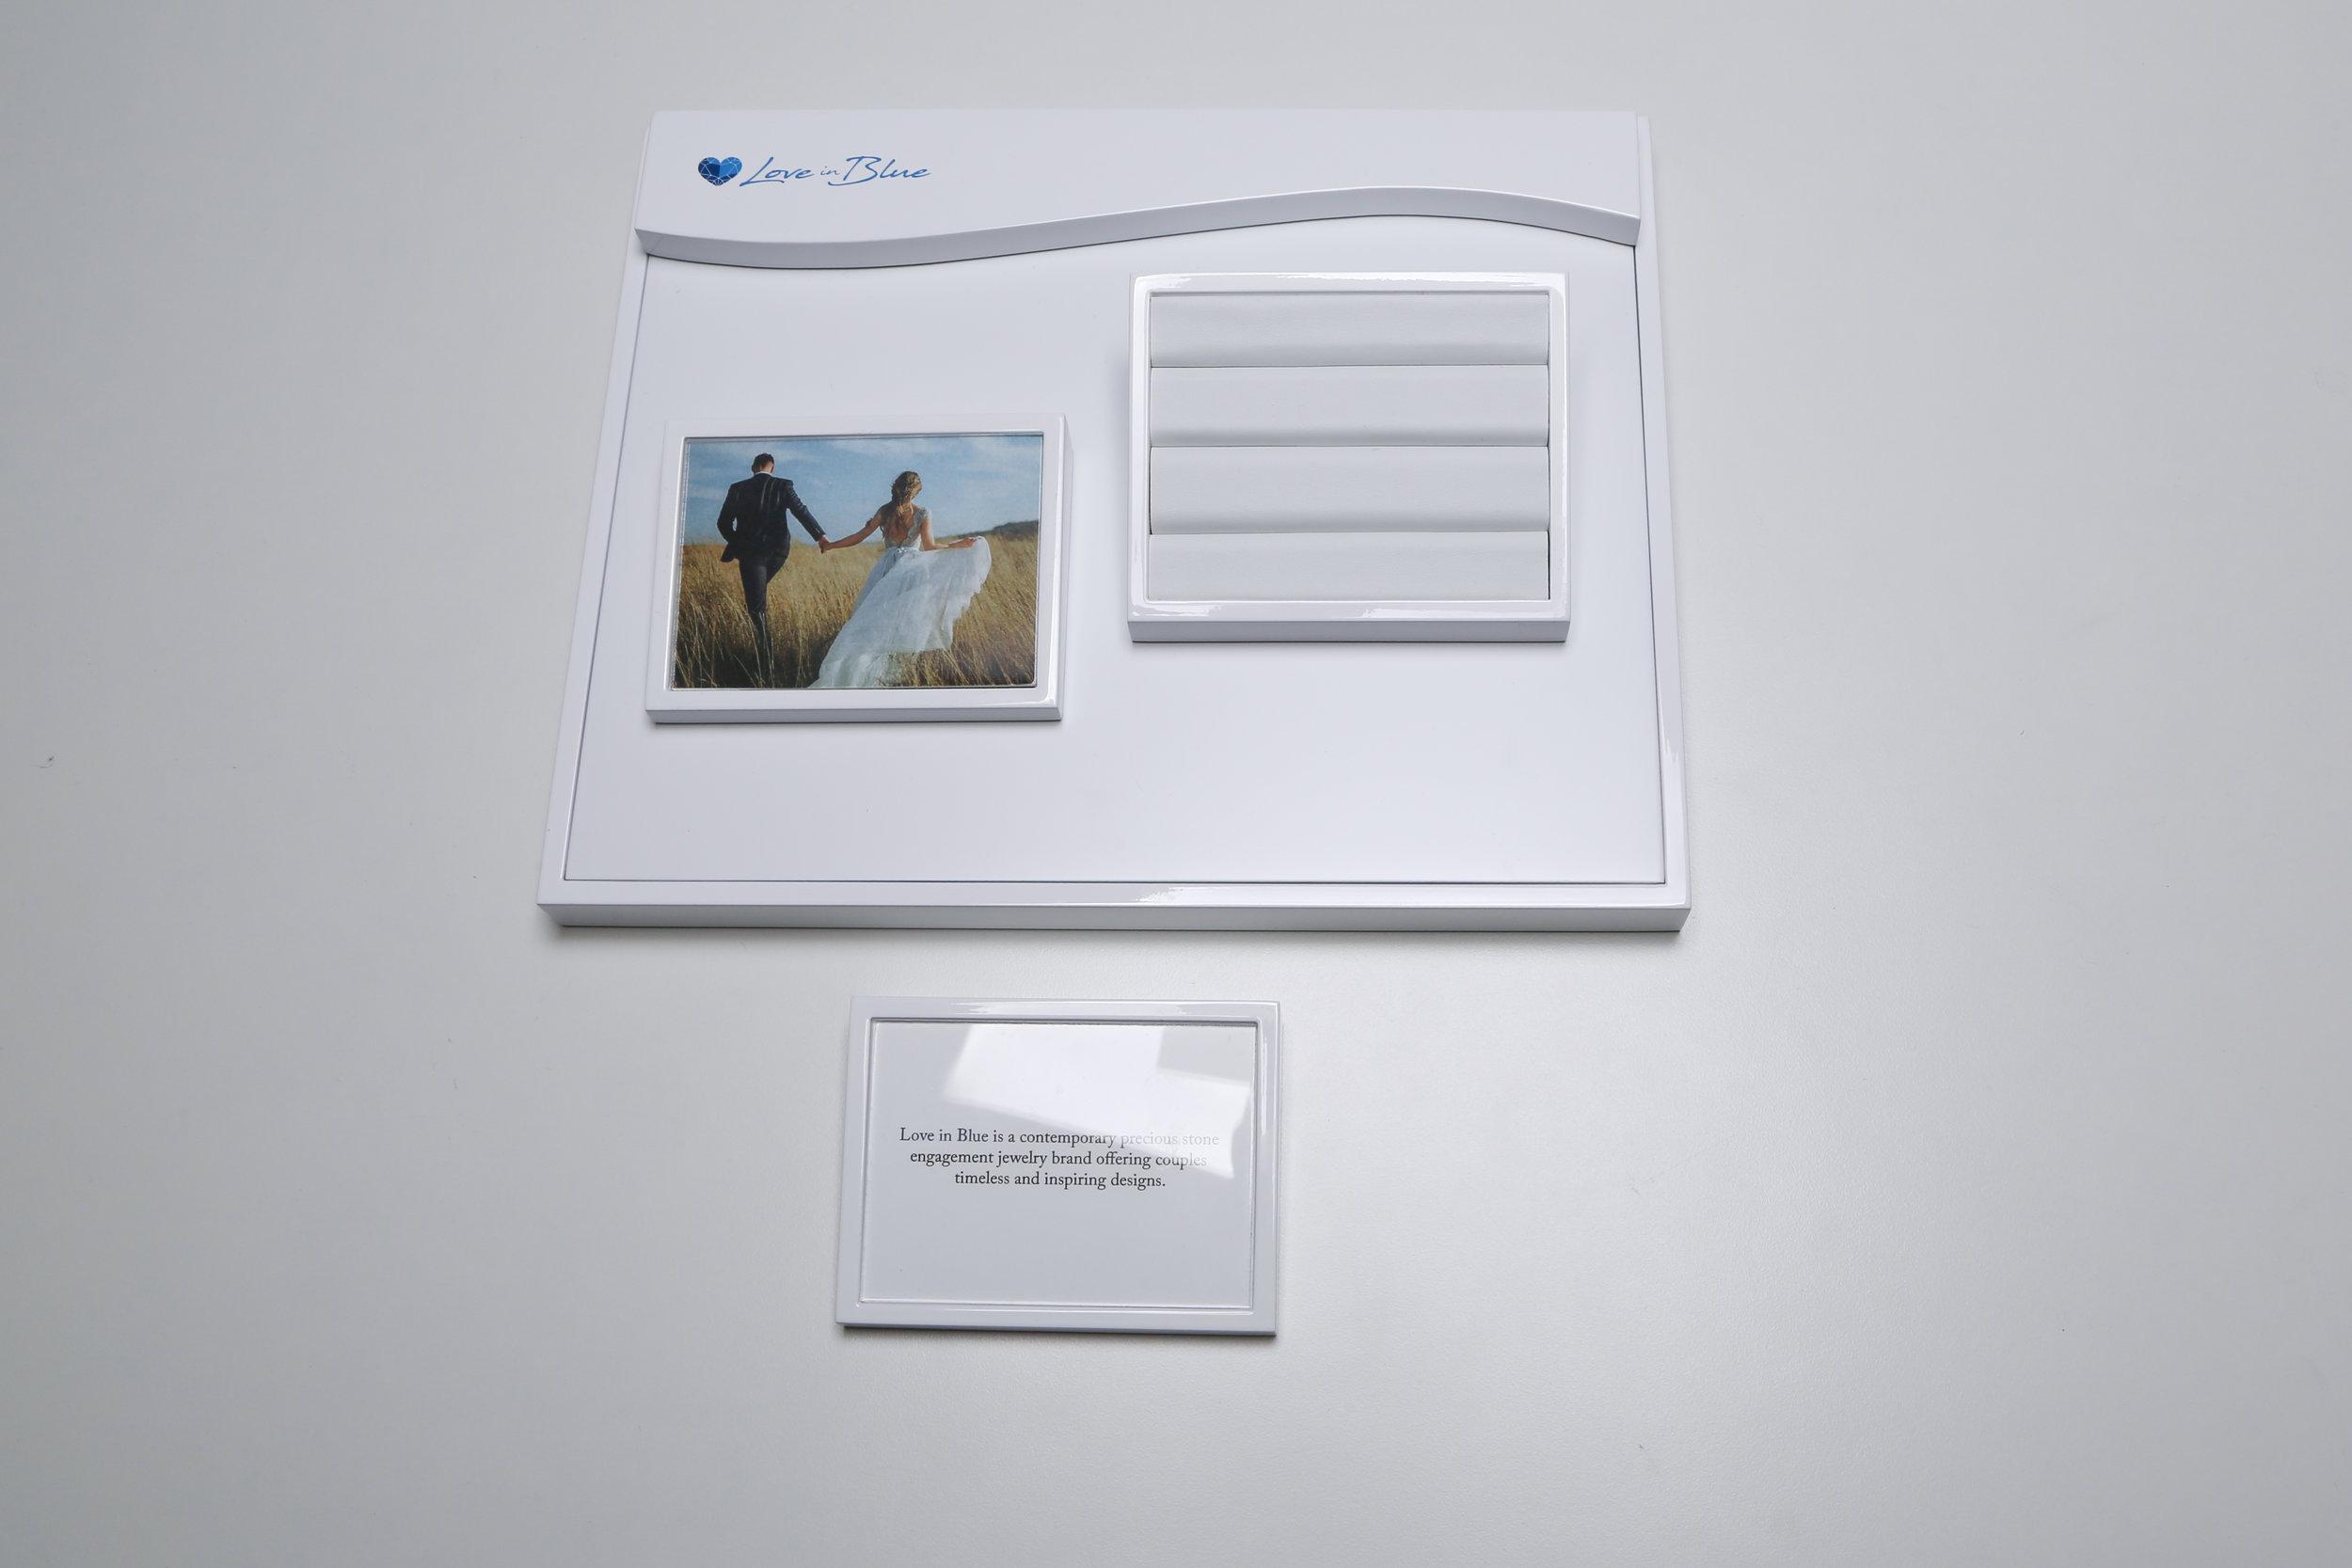 Display-A.jpg